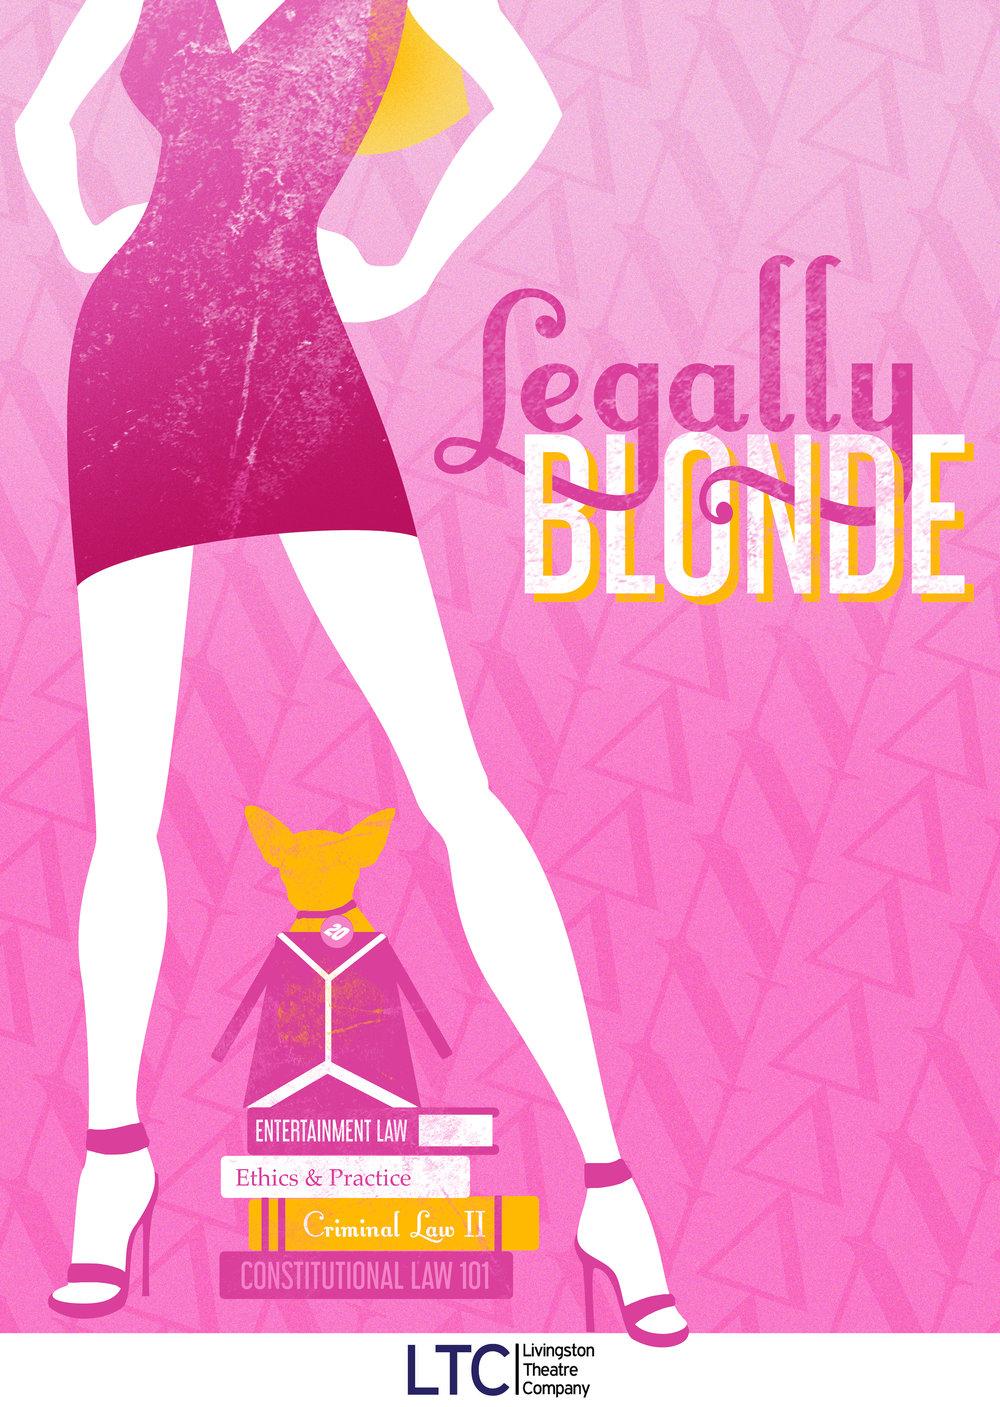 Legally Blonde Poster 2.jpg